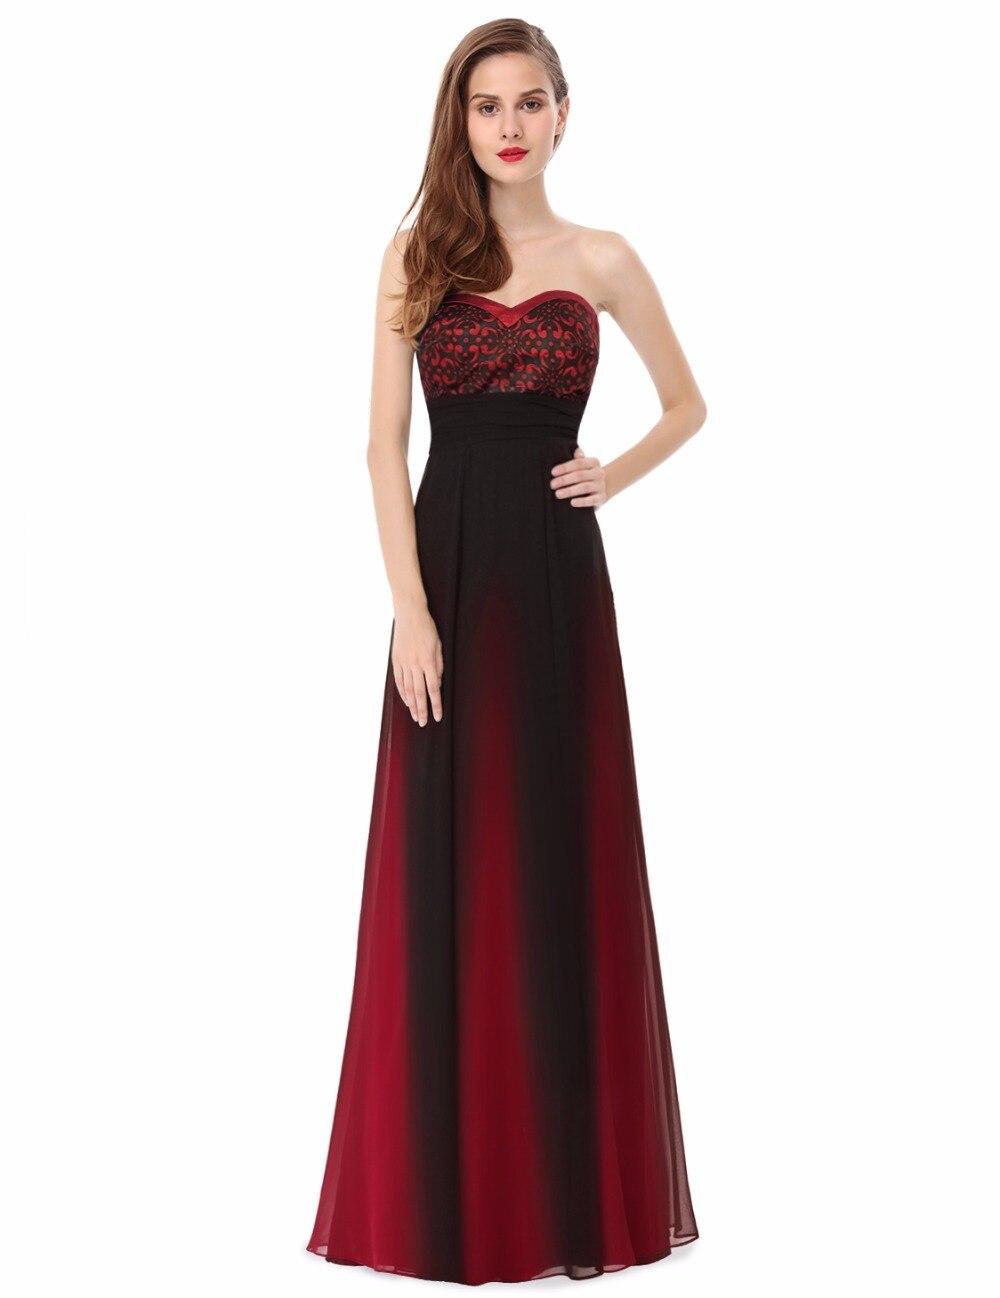 92b0d1b728f8  Saldi  Abiti Da Sera Rosso Elegante Senza Spalline Abiti Da Sera Lunghi  2016 Vestidos HE08070SB in  Saldi  Abiti Da Sera Rosso Elegante Senza  Spalline ...